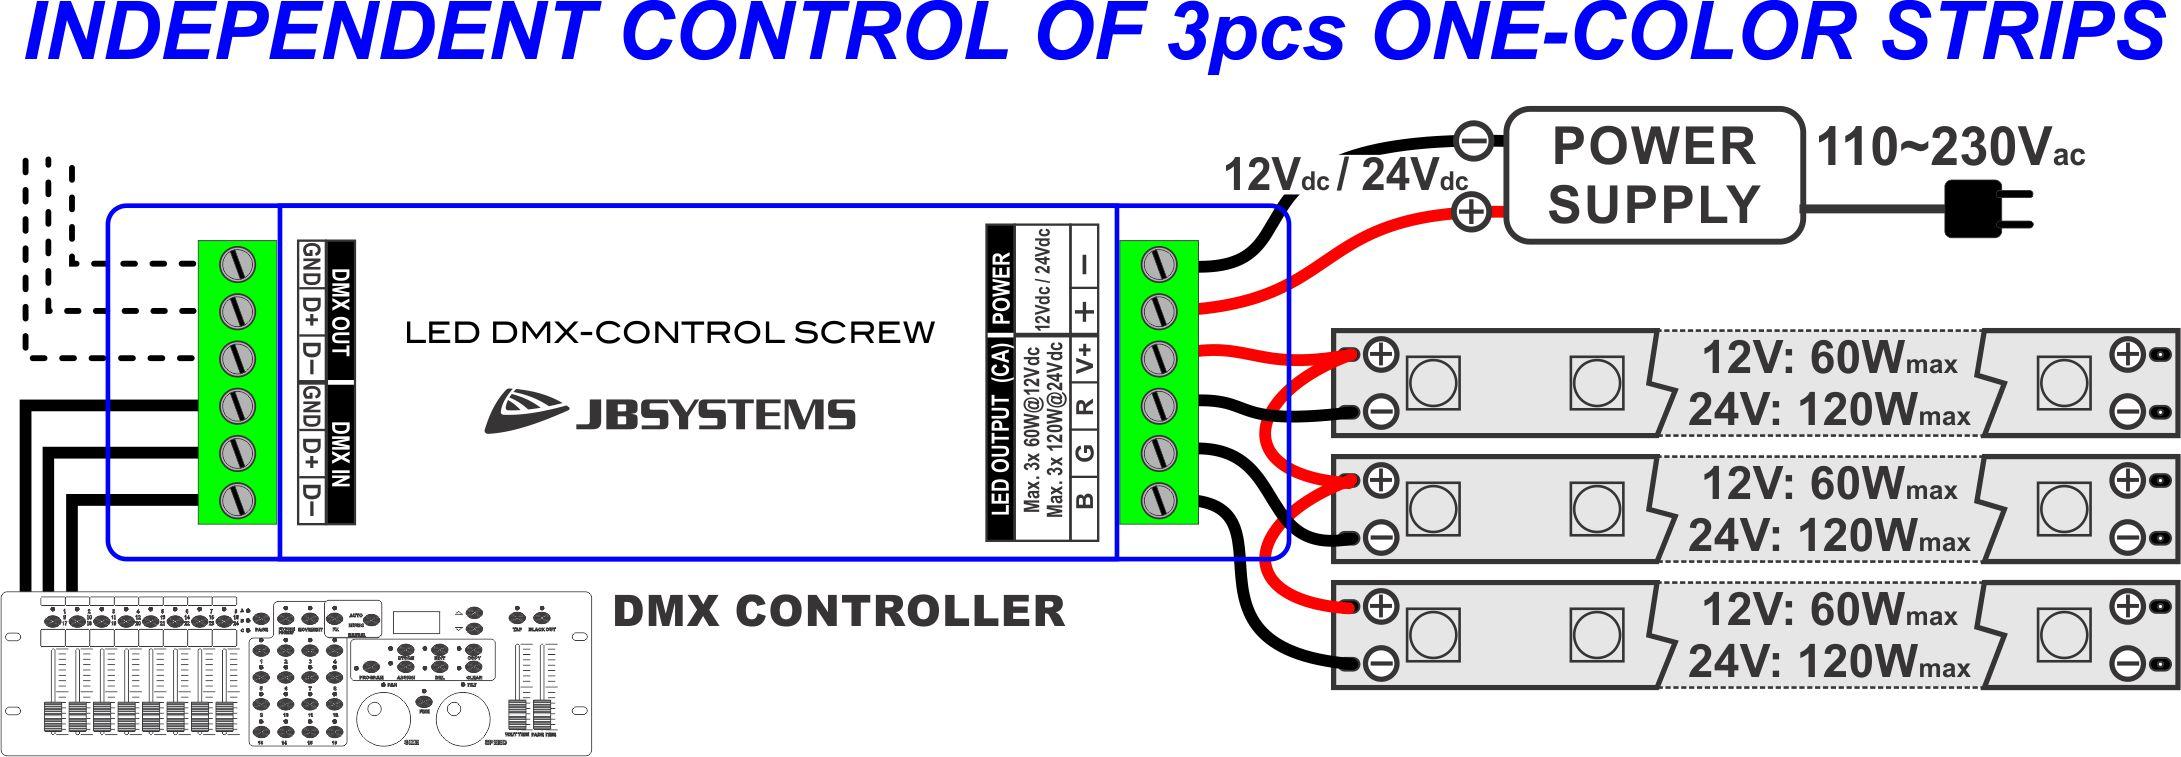 Jb Systems Led Dmx Control Screw Controller Psu Wiring Diagram